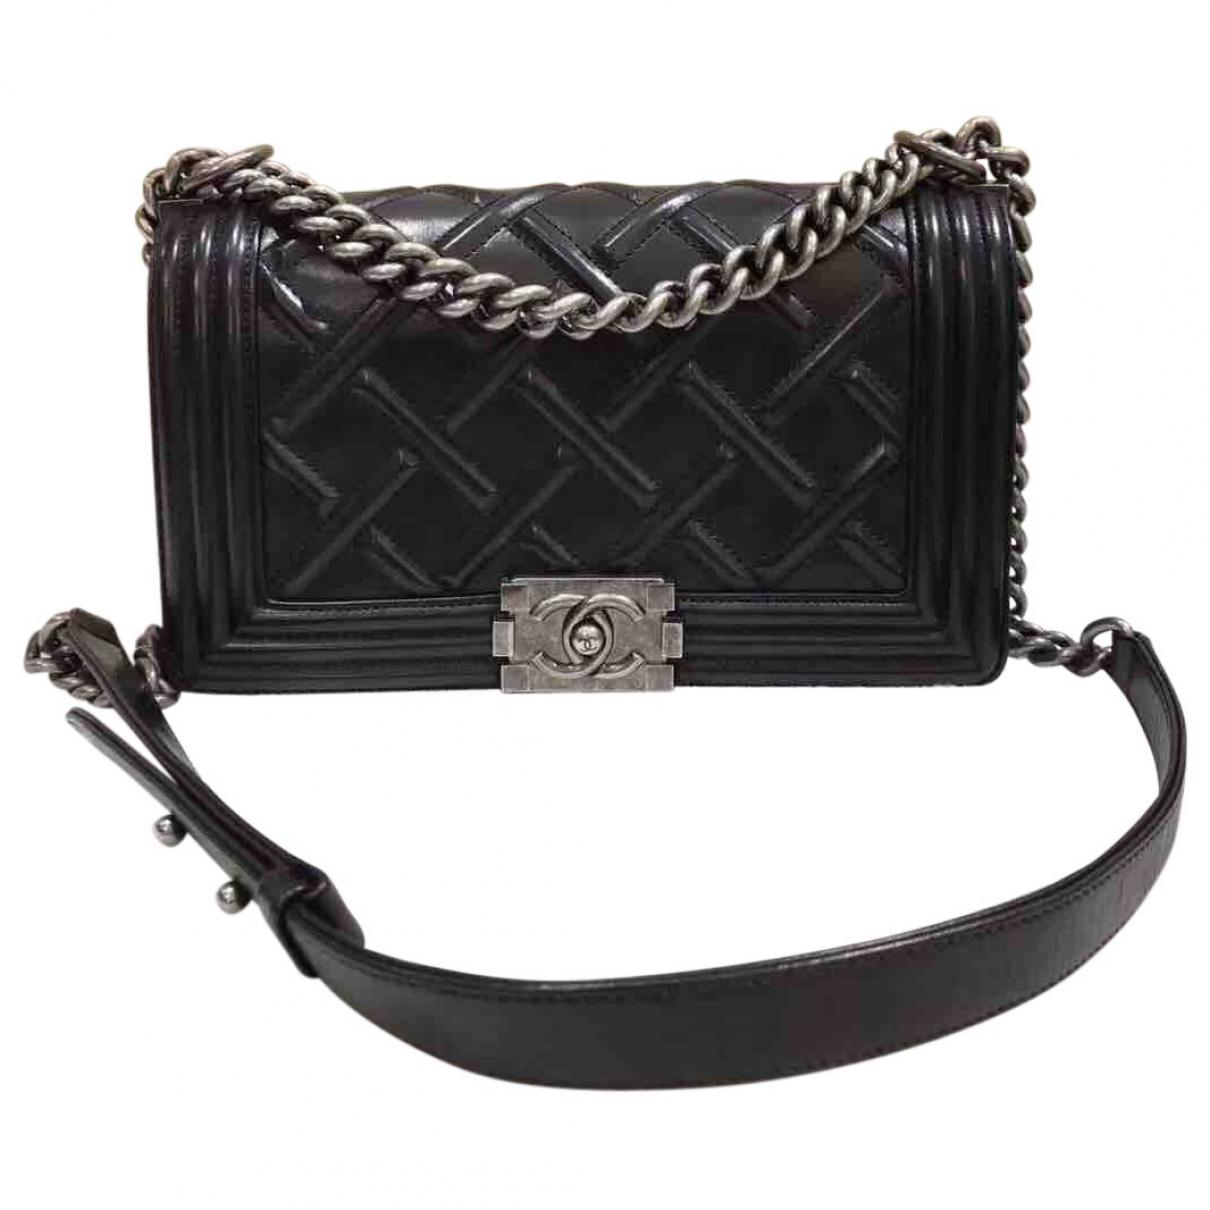 Chanel Pre-owned - Boy leather handbag 74xxsJ